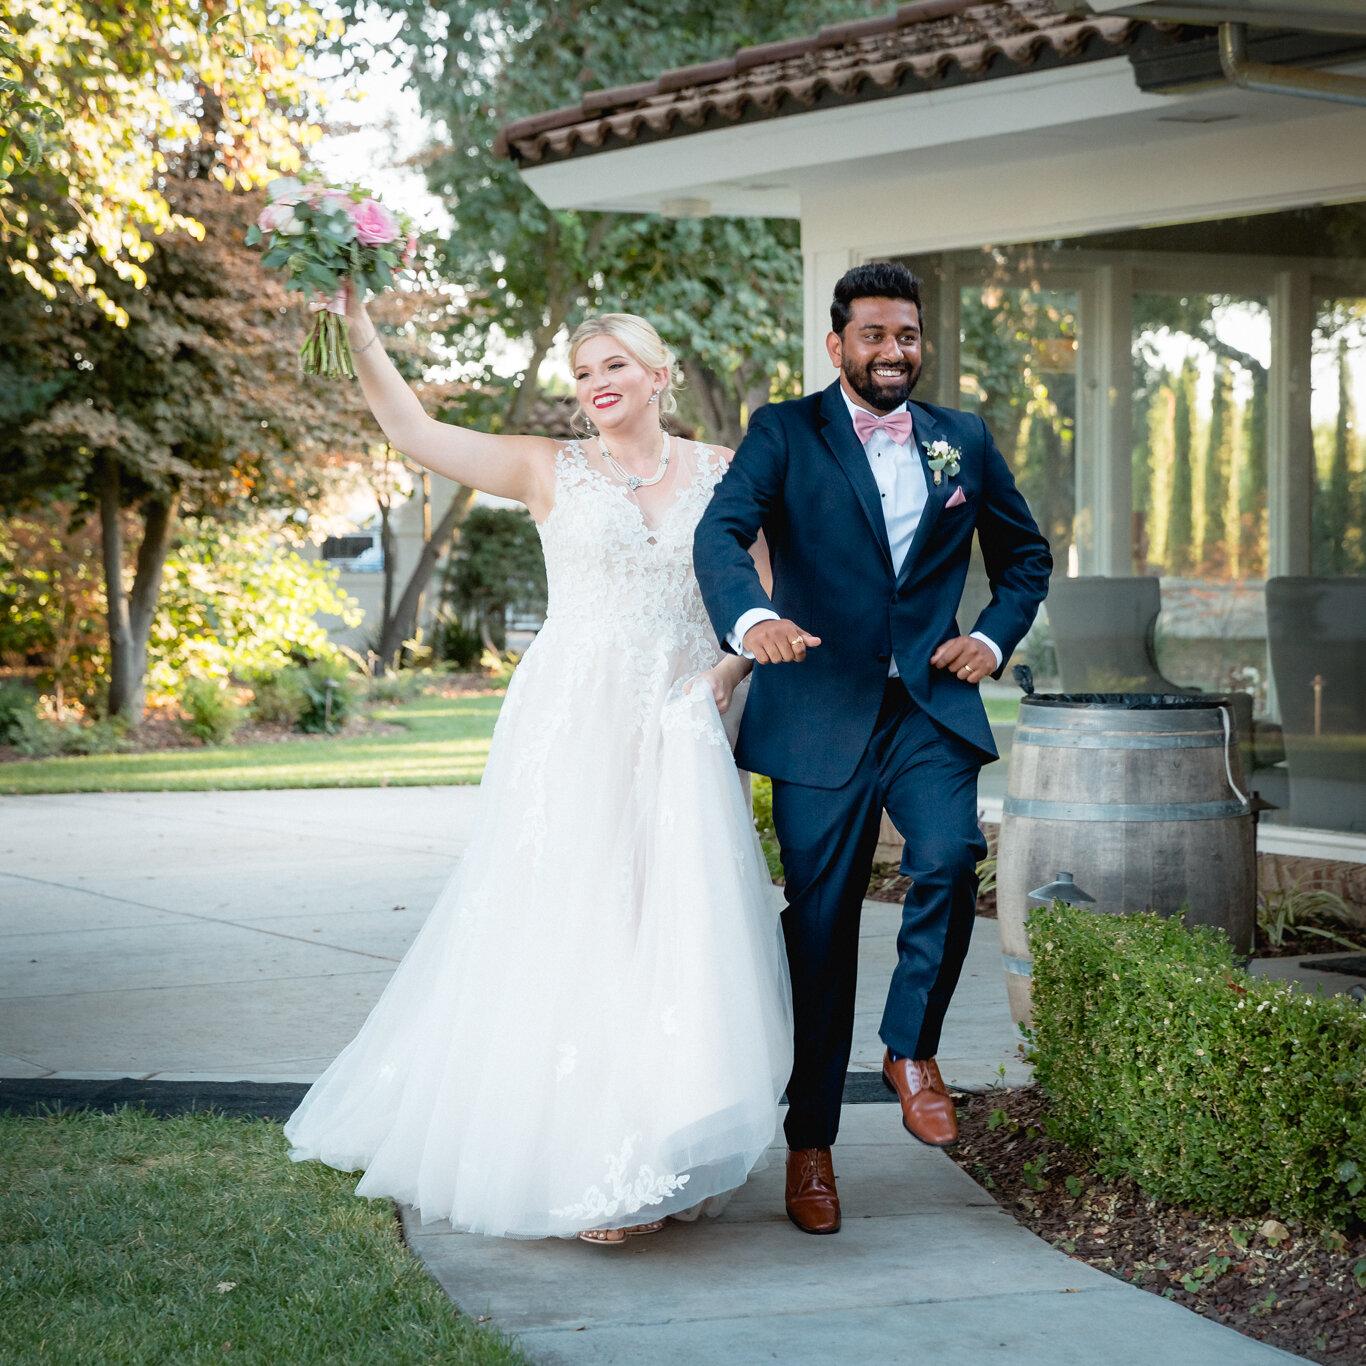 2019.08.24_Emily-Ashir-Wedding-at-the-Maples-6168.jpg